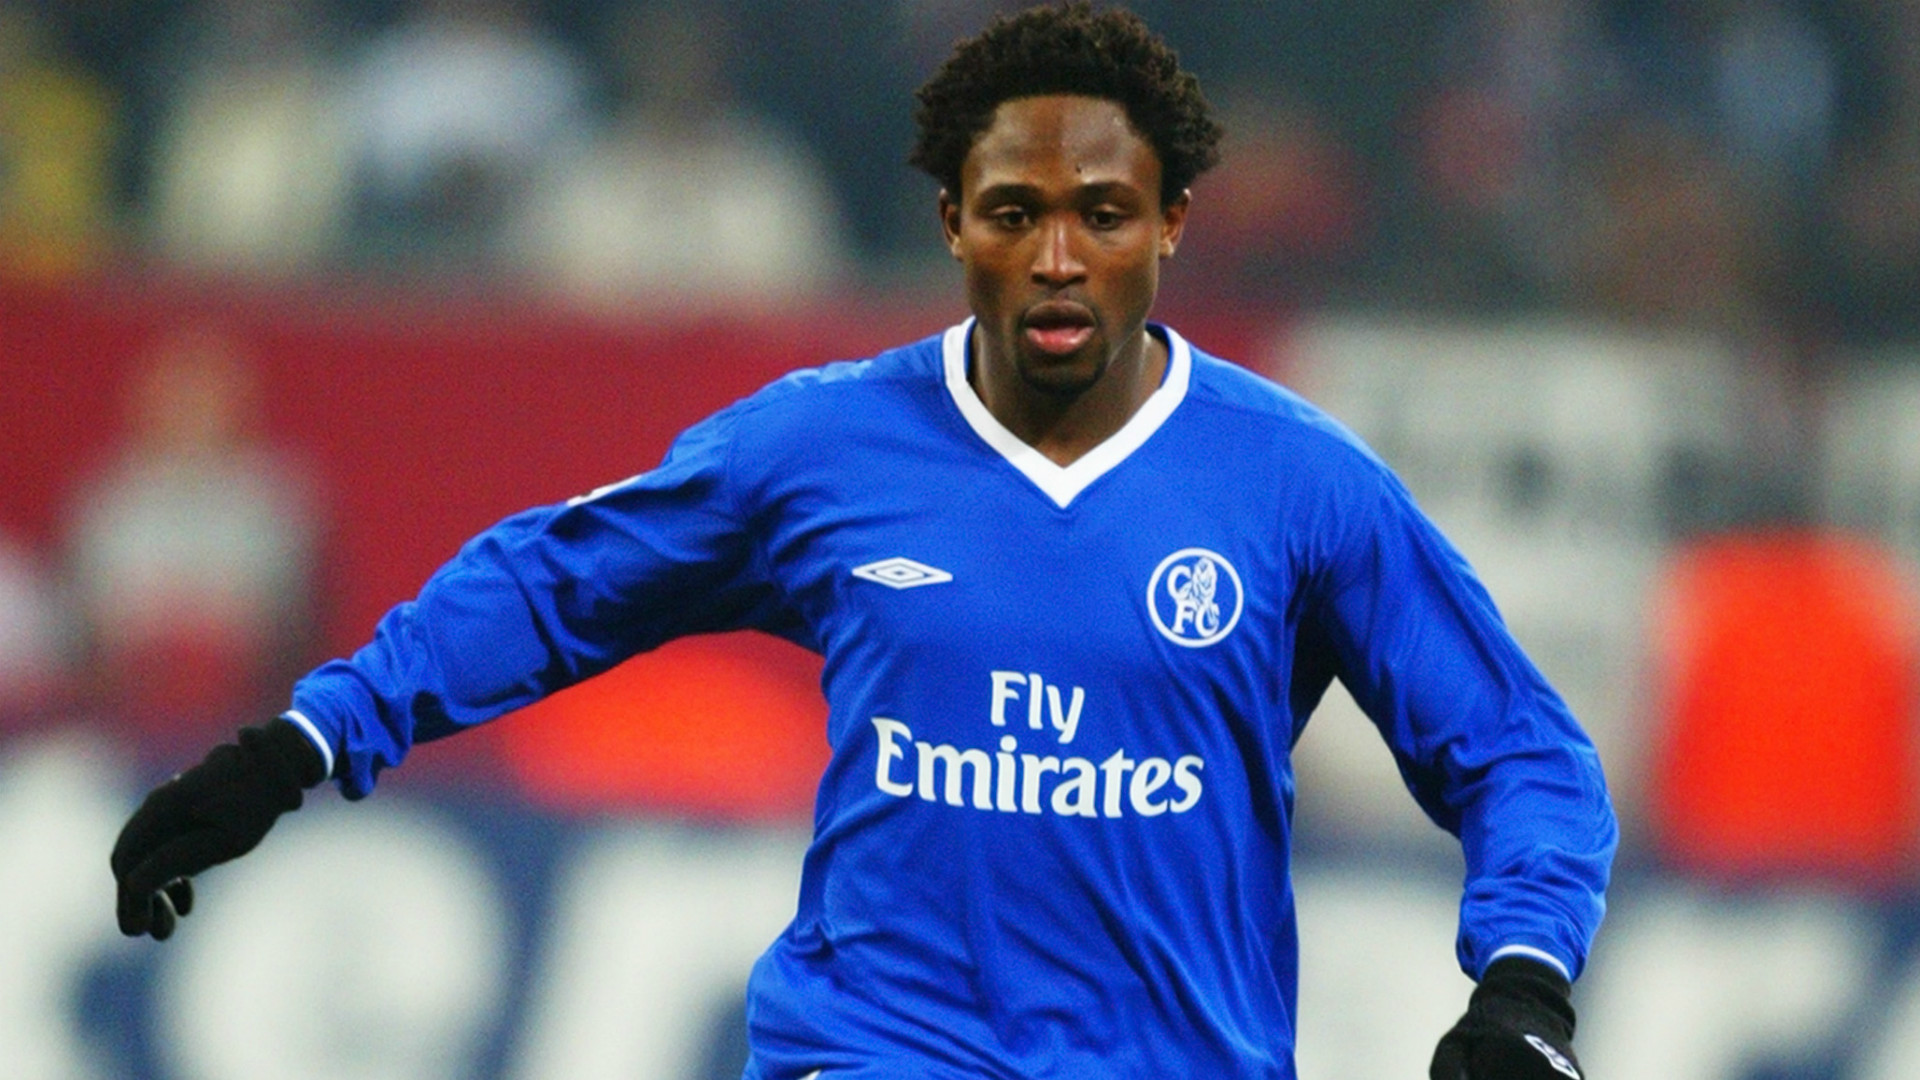 celestine babayaro chelsea 1dvcdzzilho5k123gqrbgz1xlq - Sodje names former Chelsea star Babayaro as greatest Nigerian to play in Premier League